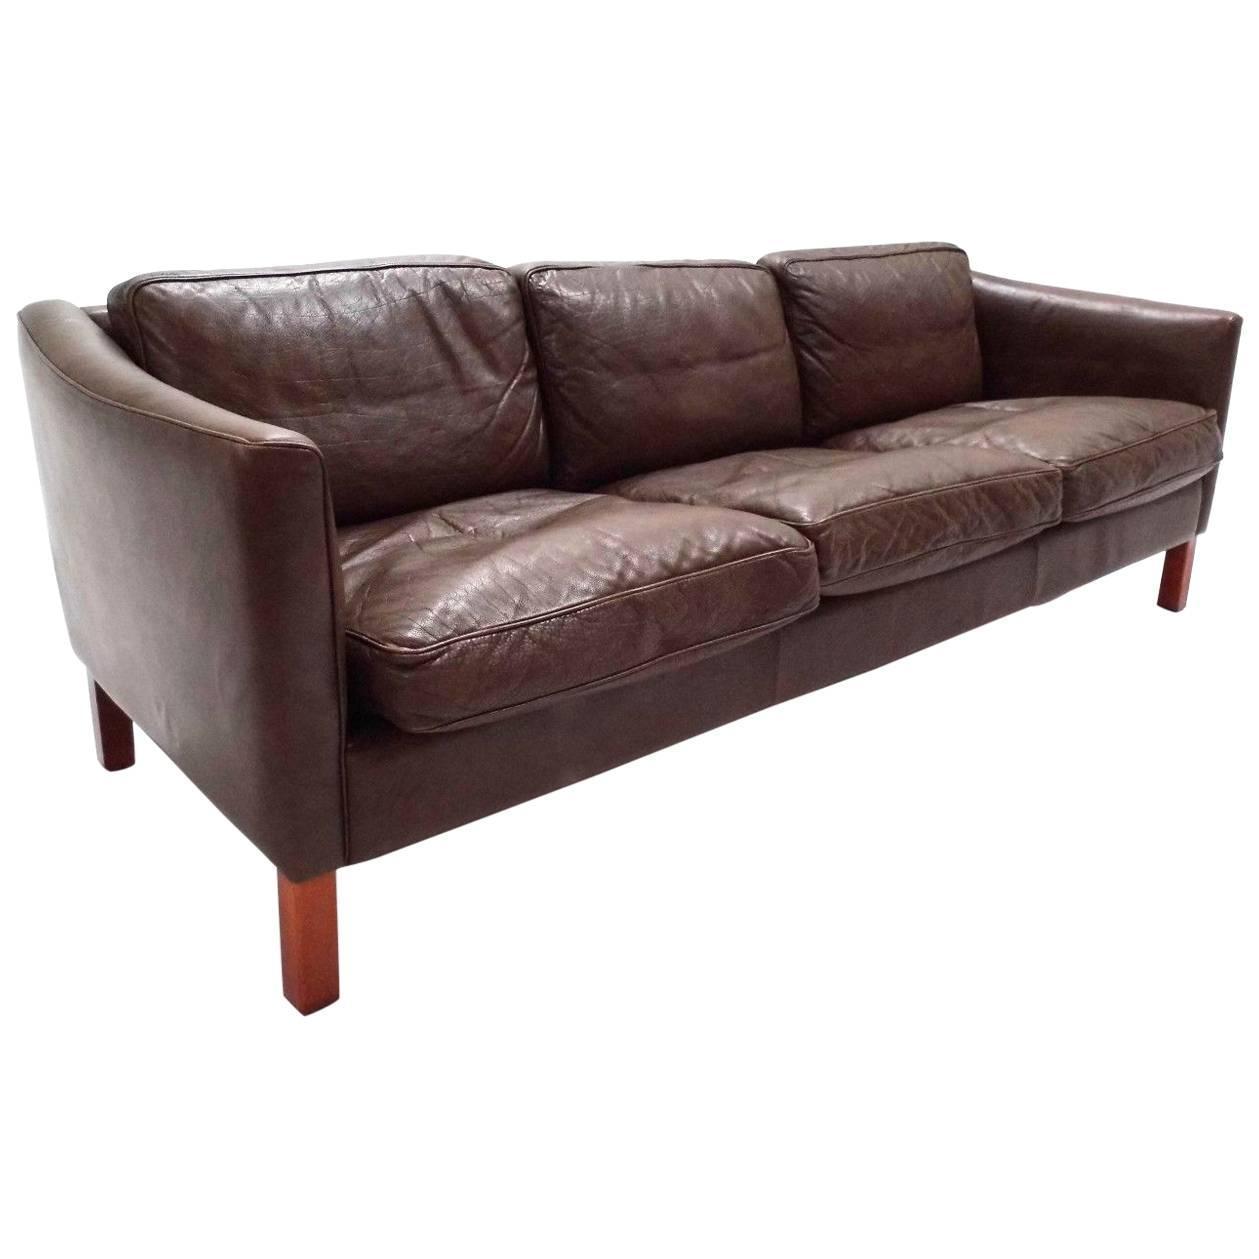 Sofá Clapton: Danish Olive Brown Leather Three-Seat Sofa, Midcentury